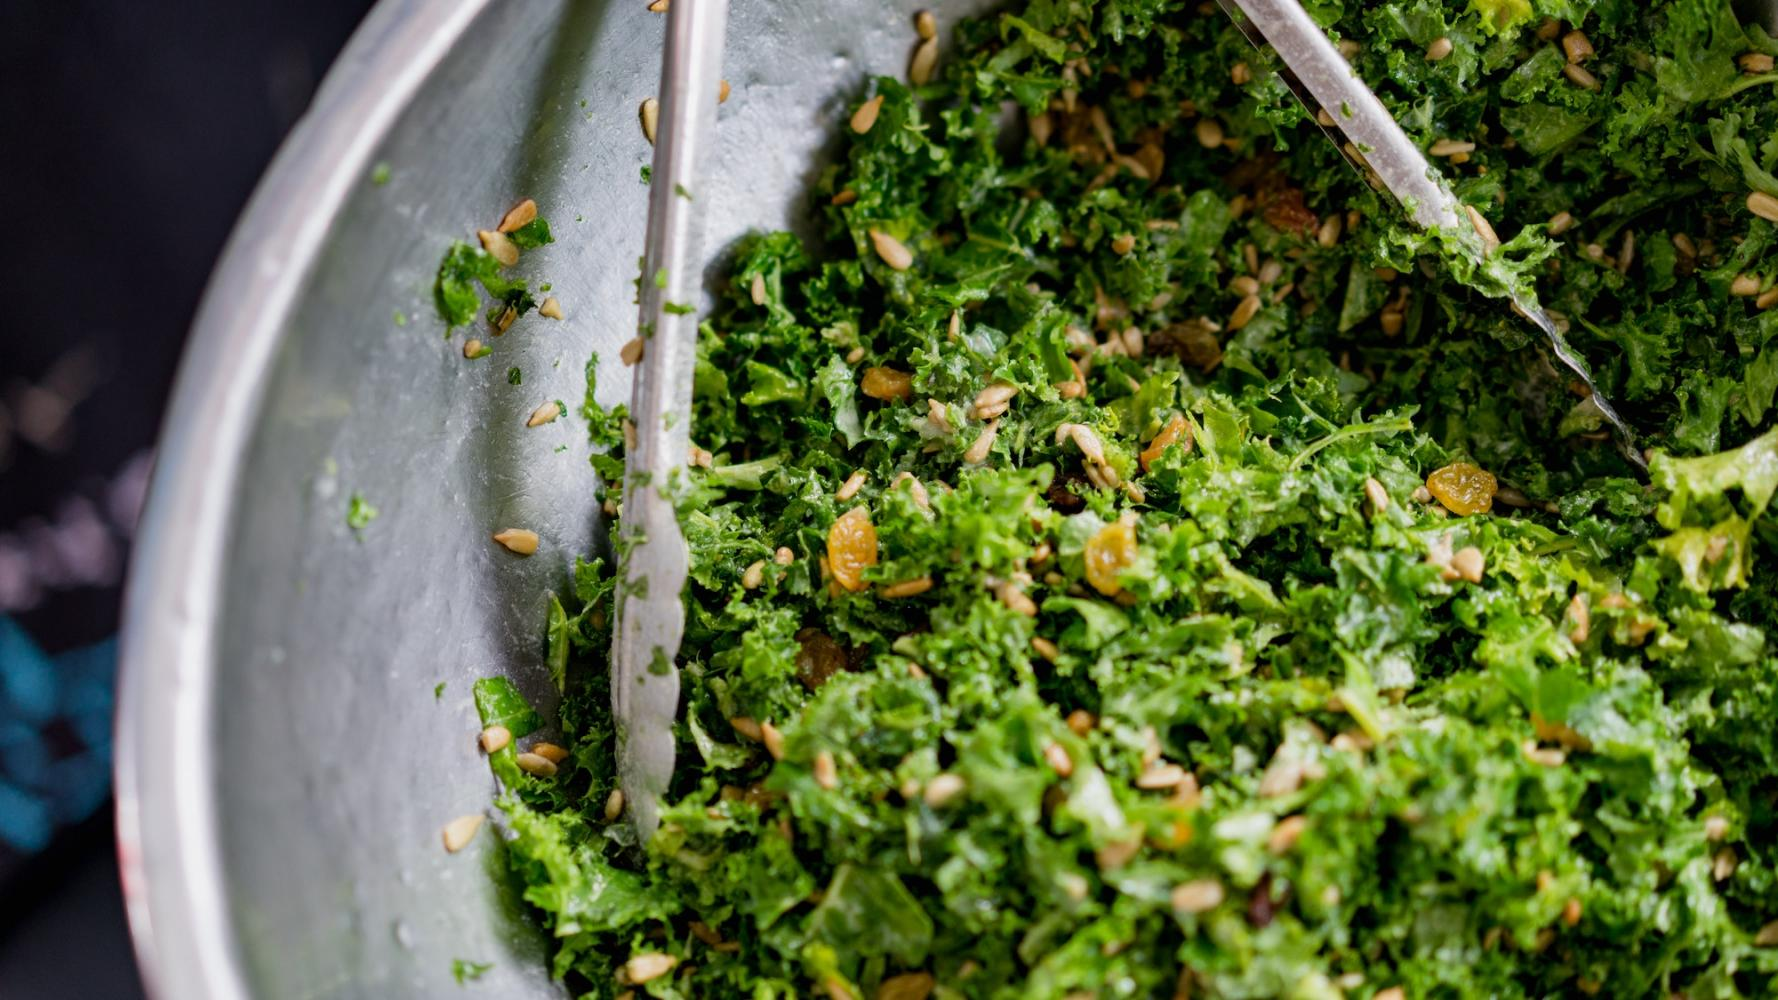 Kale - the sweet winter vegetable